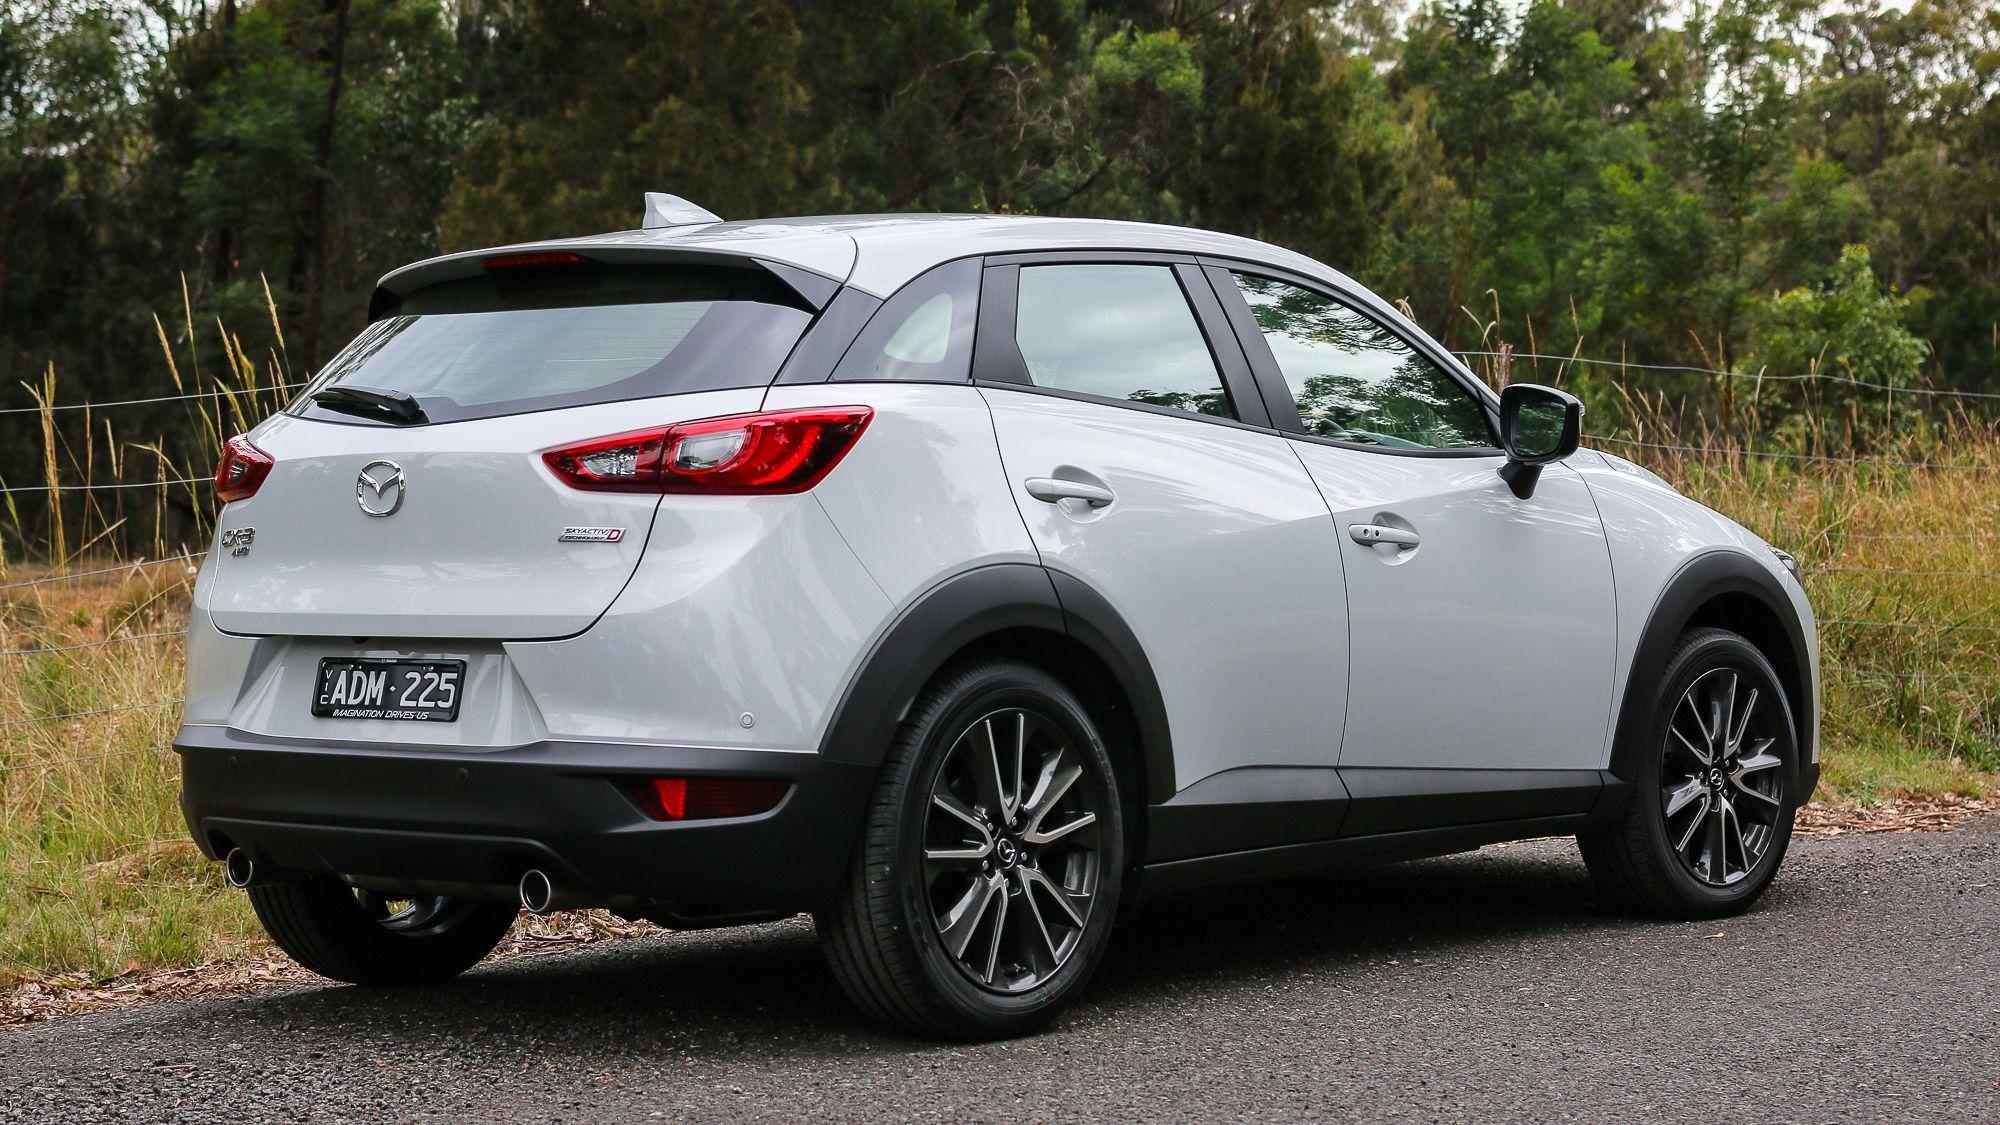 2017 mazda cx 3 grand touring review australia cars for you - Mazda 2015 Mazda Cx 3 Review